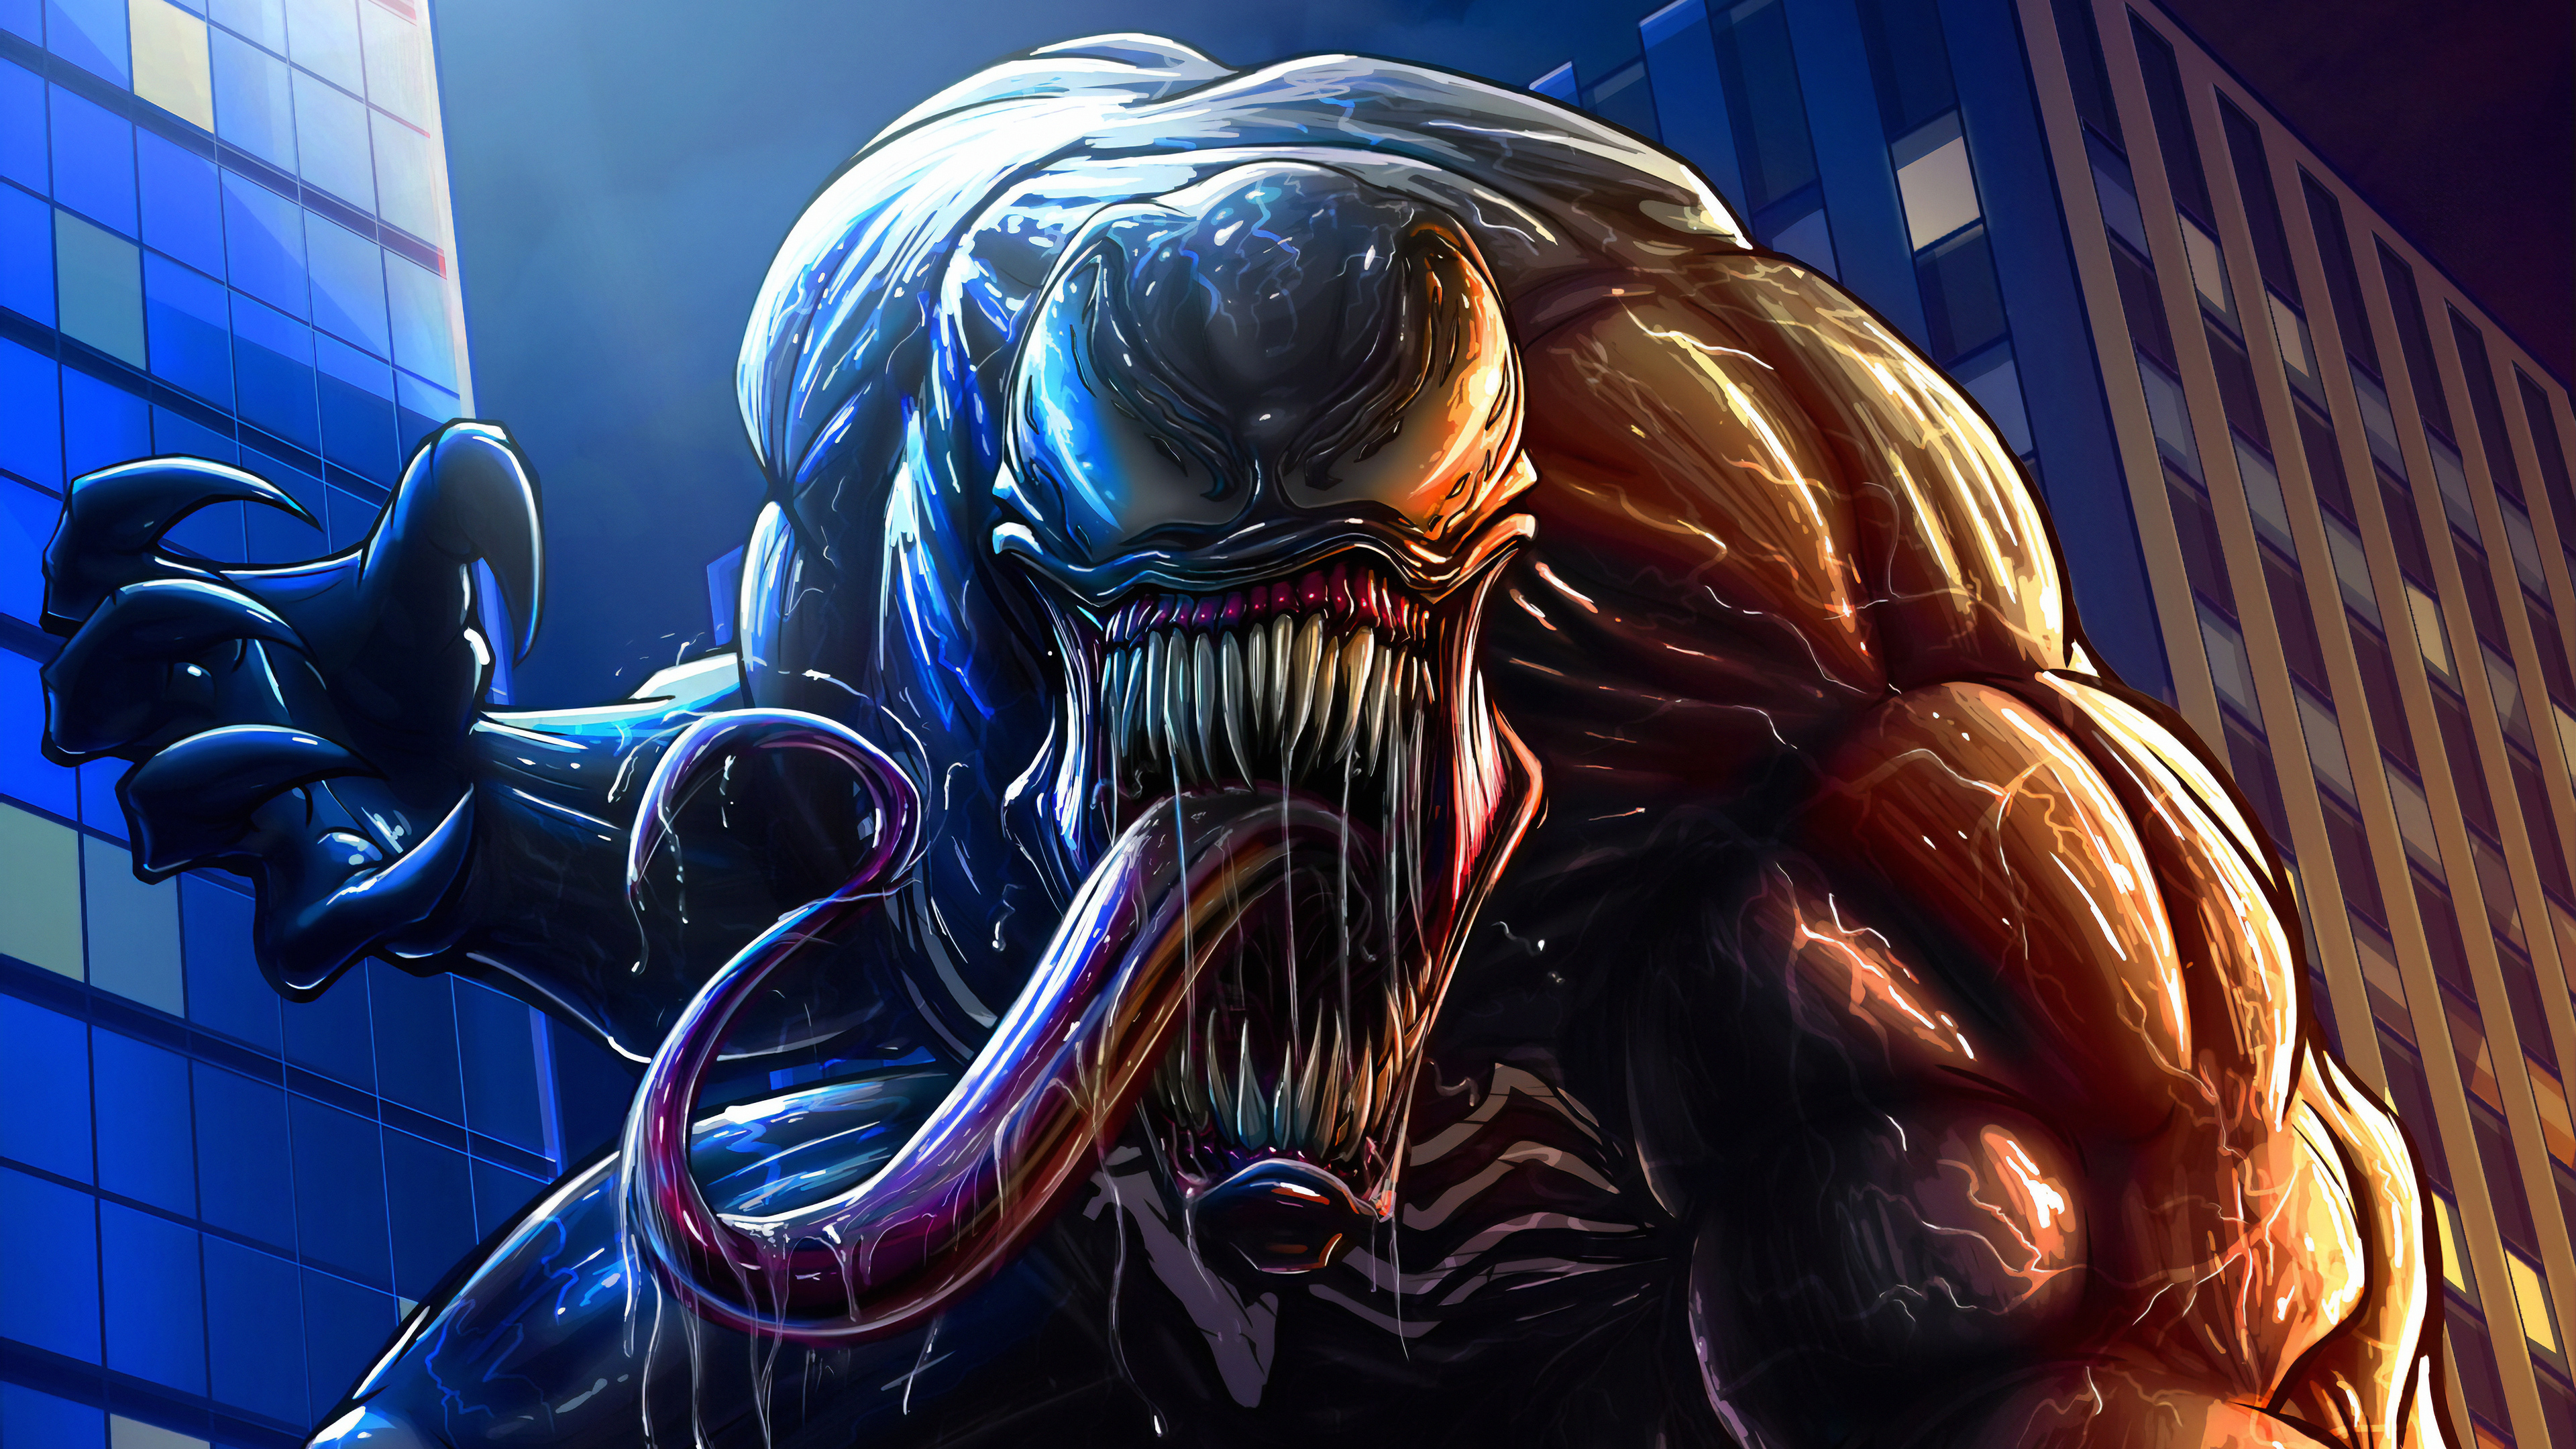 Venom Artwork Ultra Hd 4k Hd Superheroes 4k Wallpapers